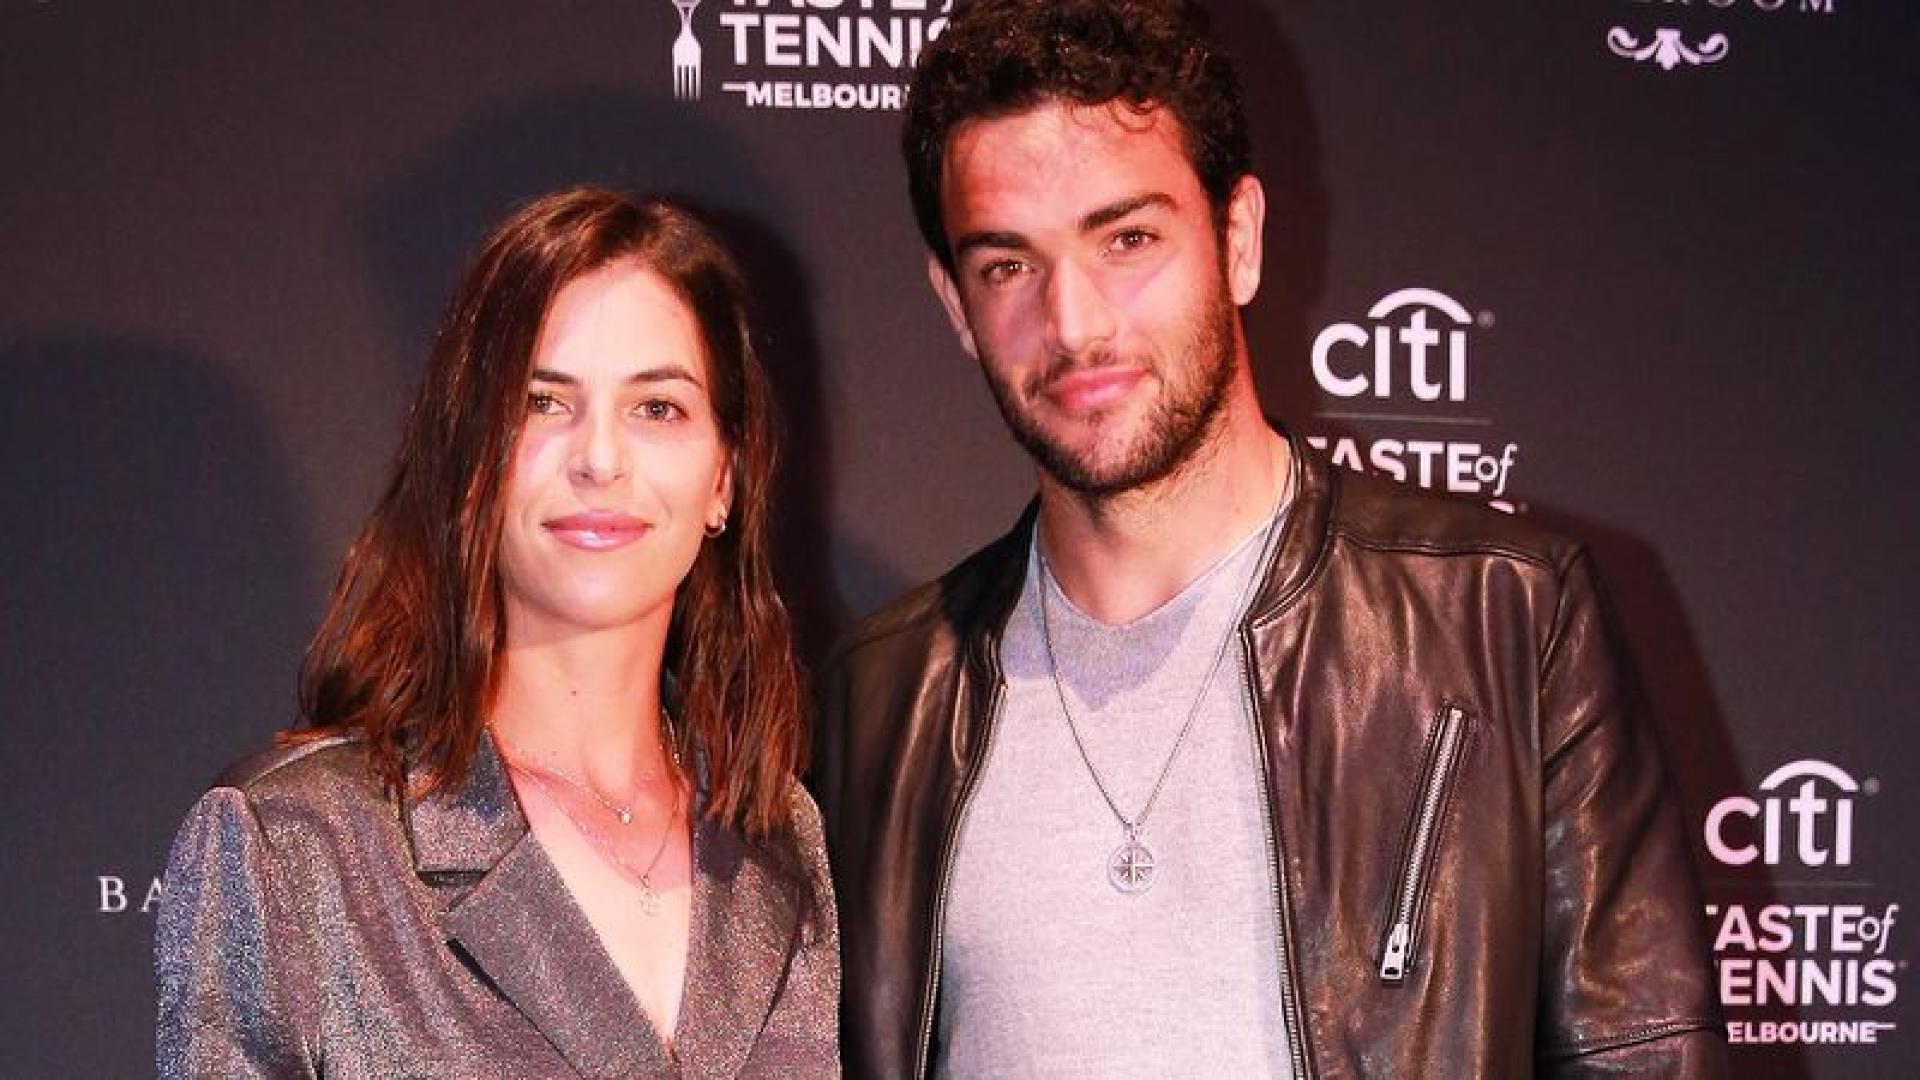 Who is Matteo Berrettini Dating?